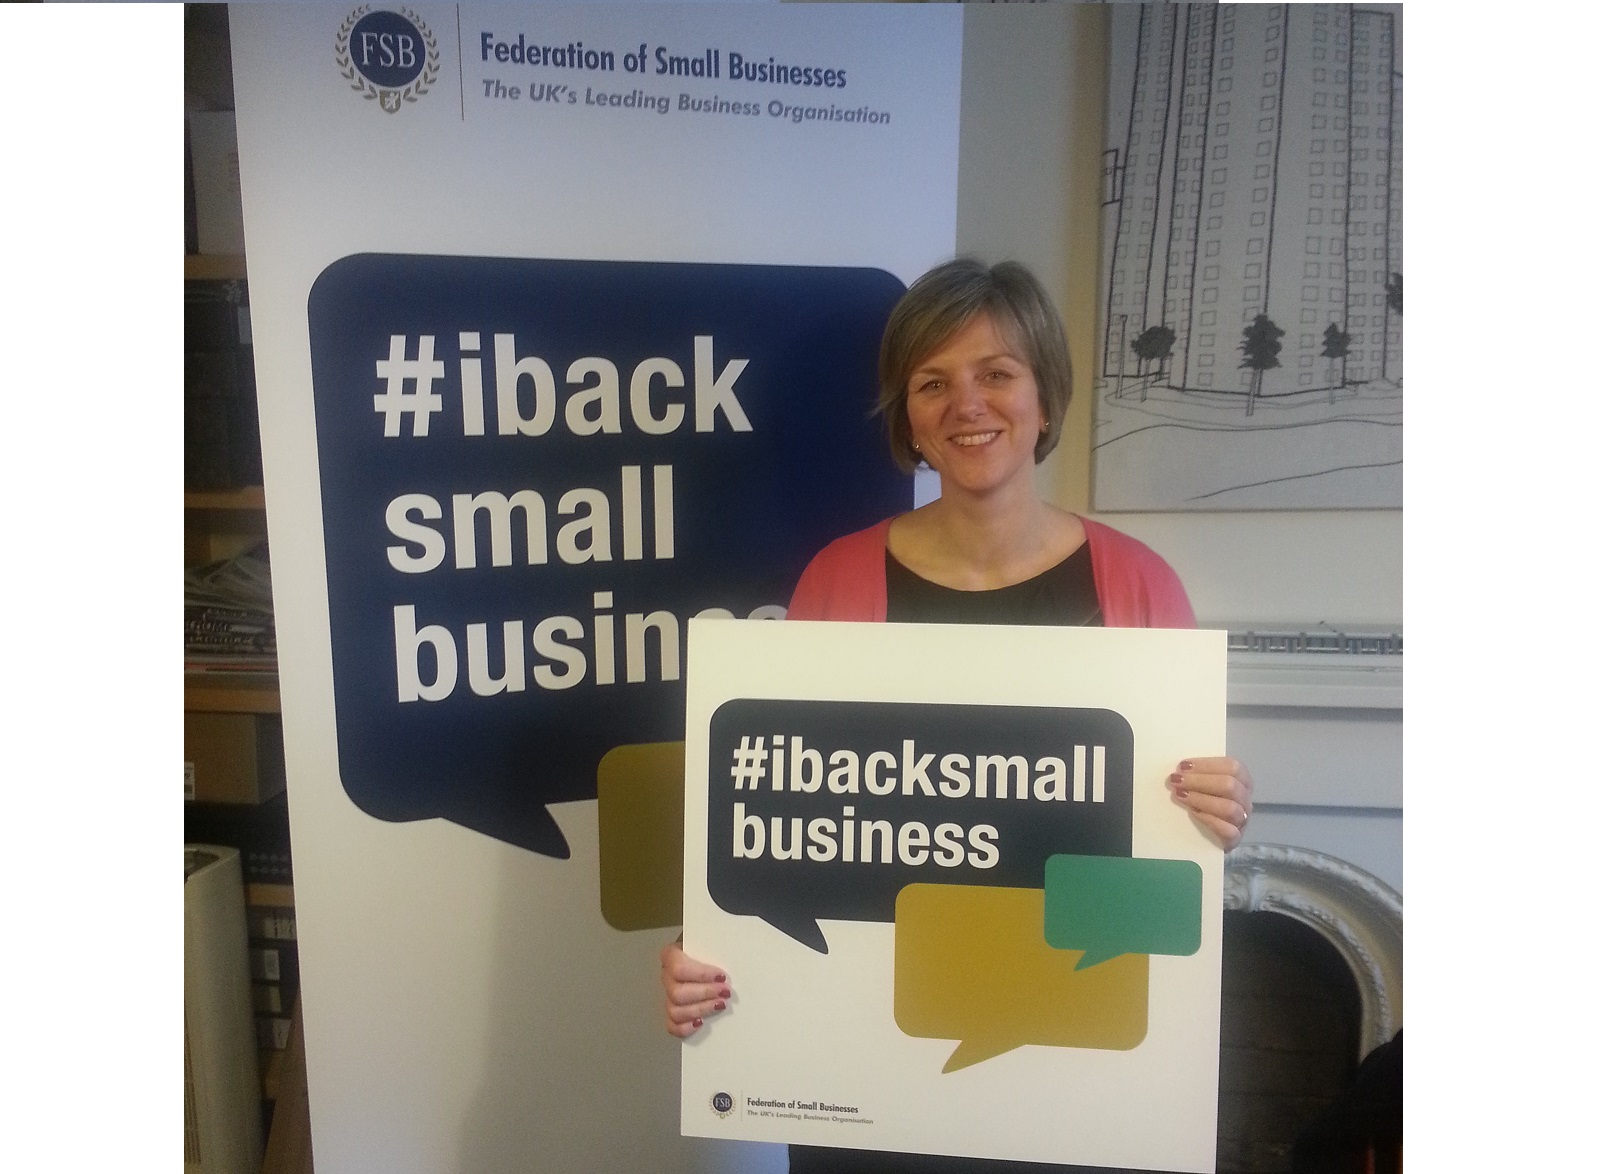 I_back_small_business_4.jpg